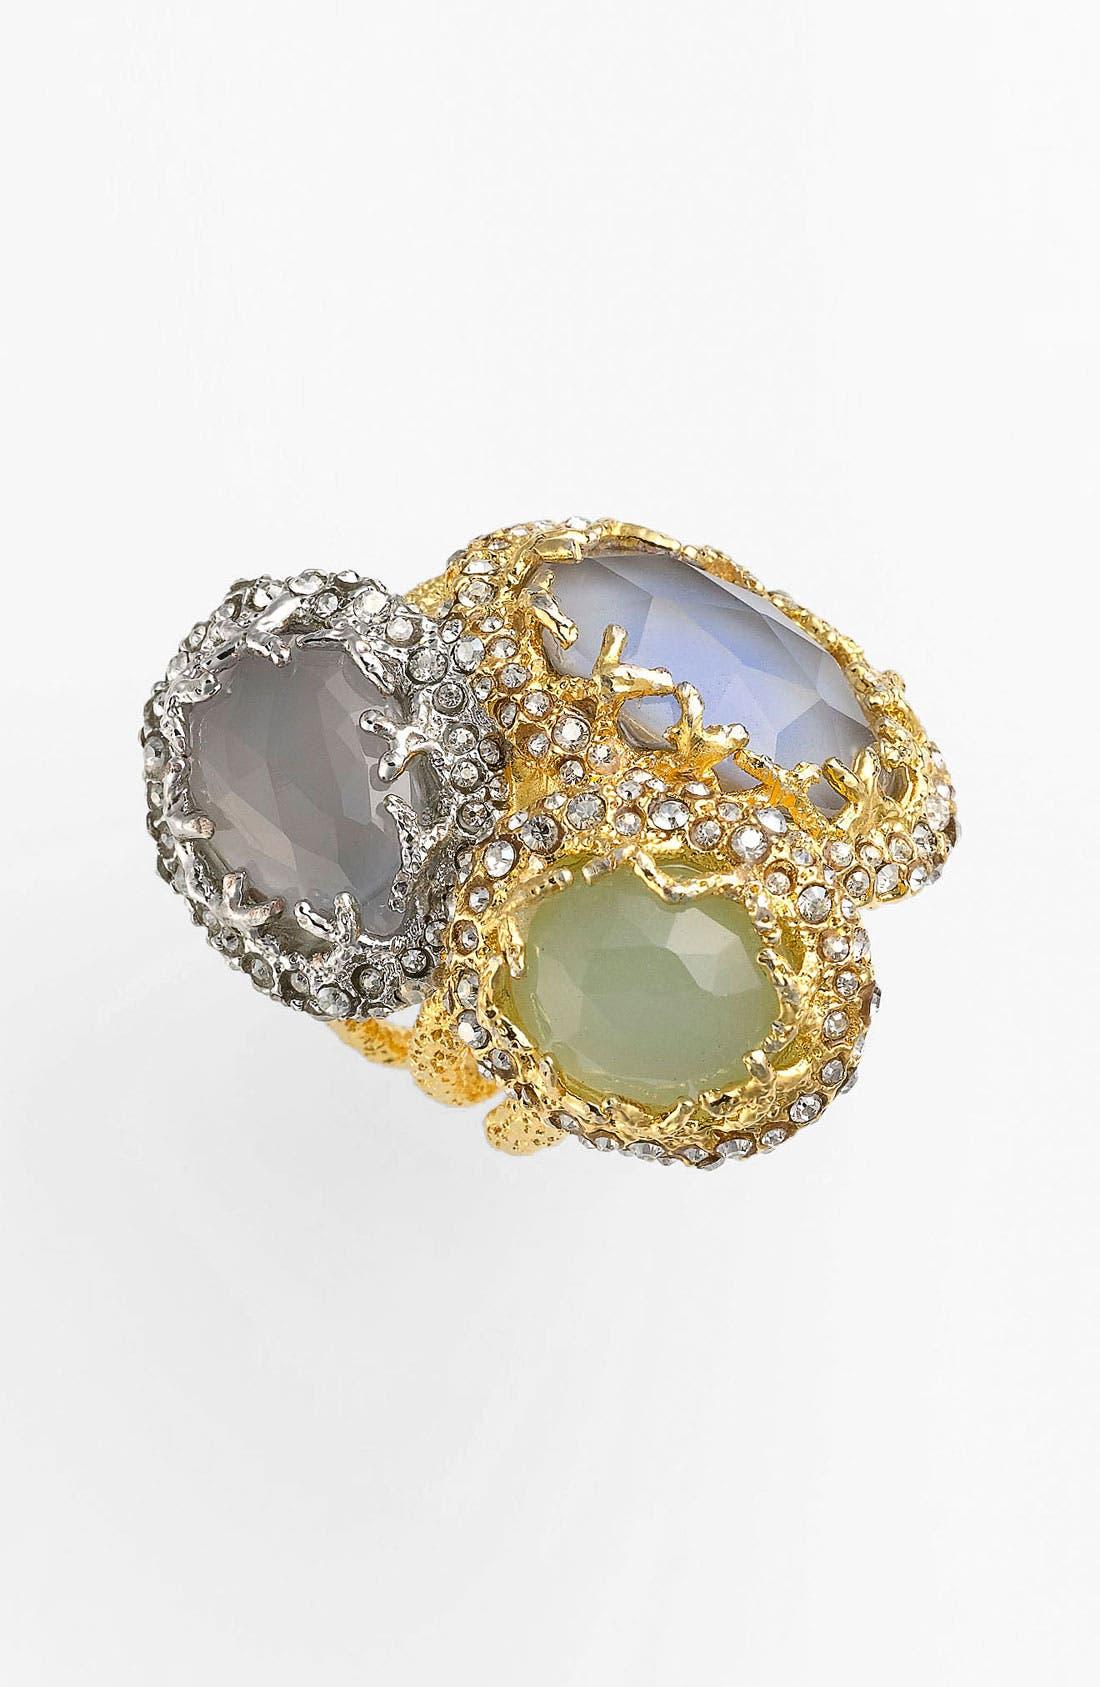 Main Image - Alexis Bittar 'Elements - Siyabona' Cluster Stone Ring